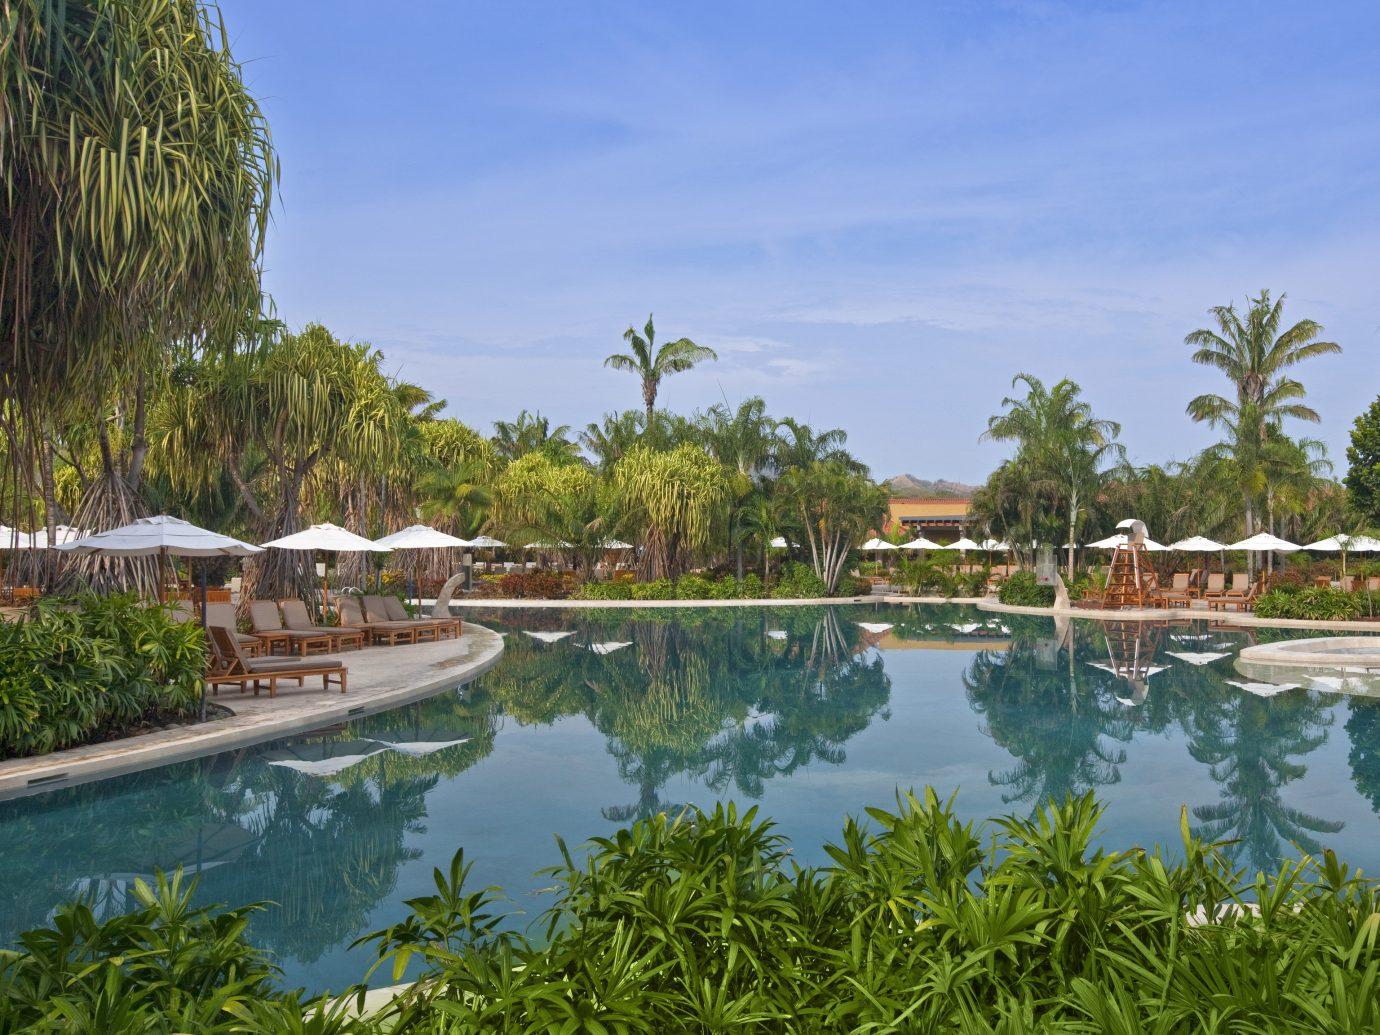 Pool at Westin Golf Resort & Spa in Playa Conchal Costa Rica